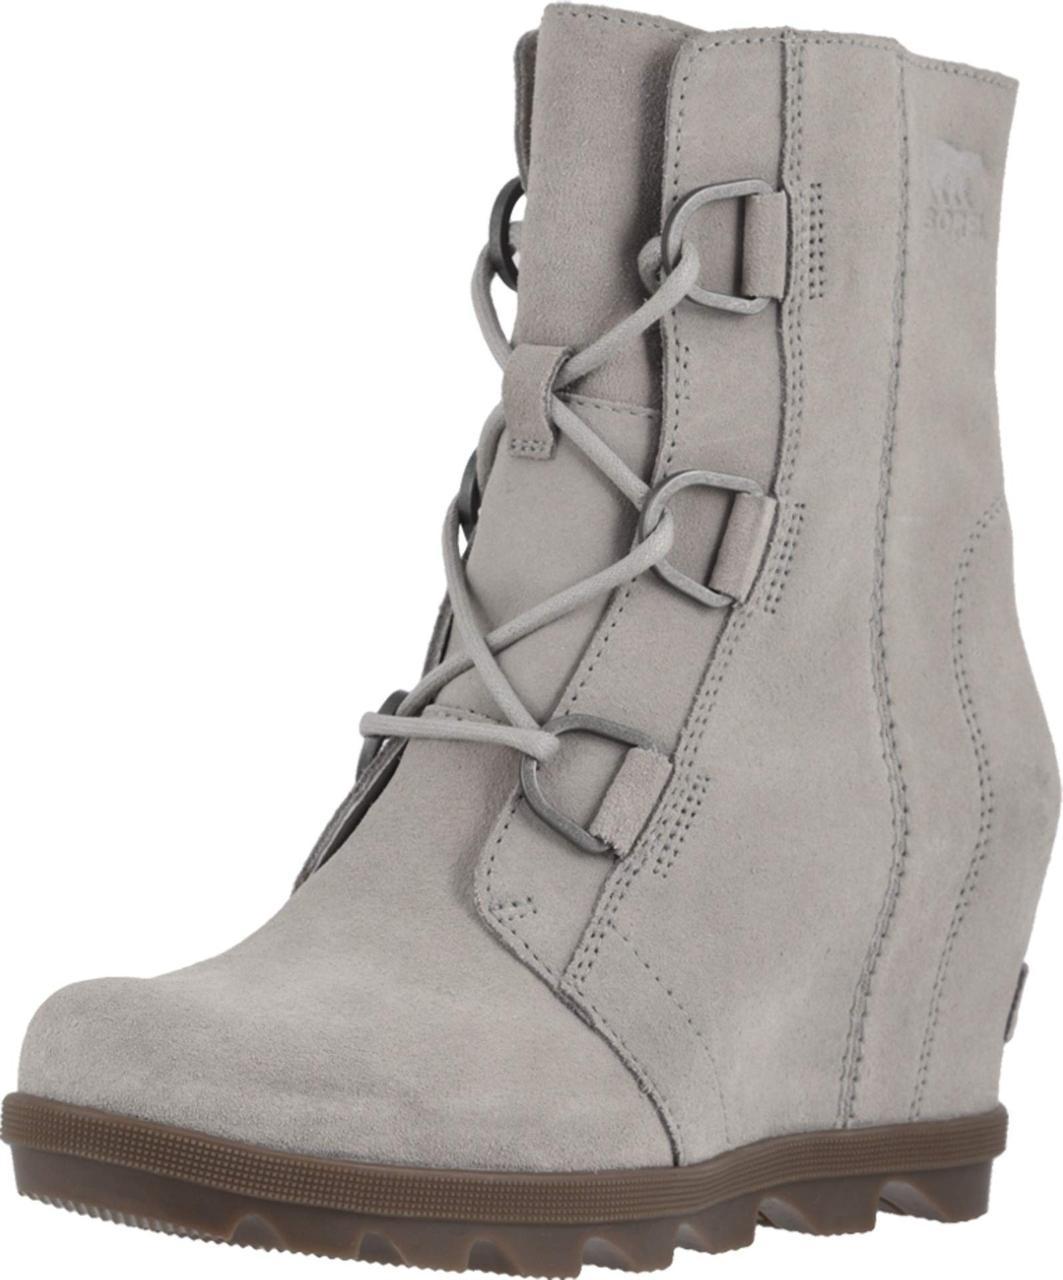 05b1f863202 Туфли на каблуке (Оригинал) SOREL Joan of Arctic™ Wedge II Dove ...